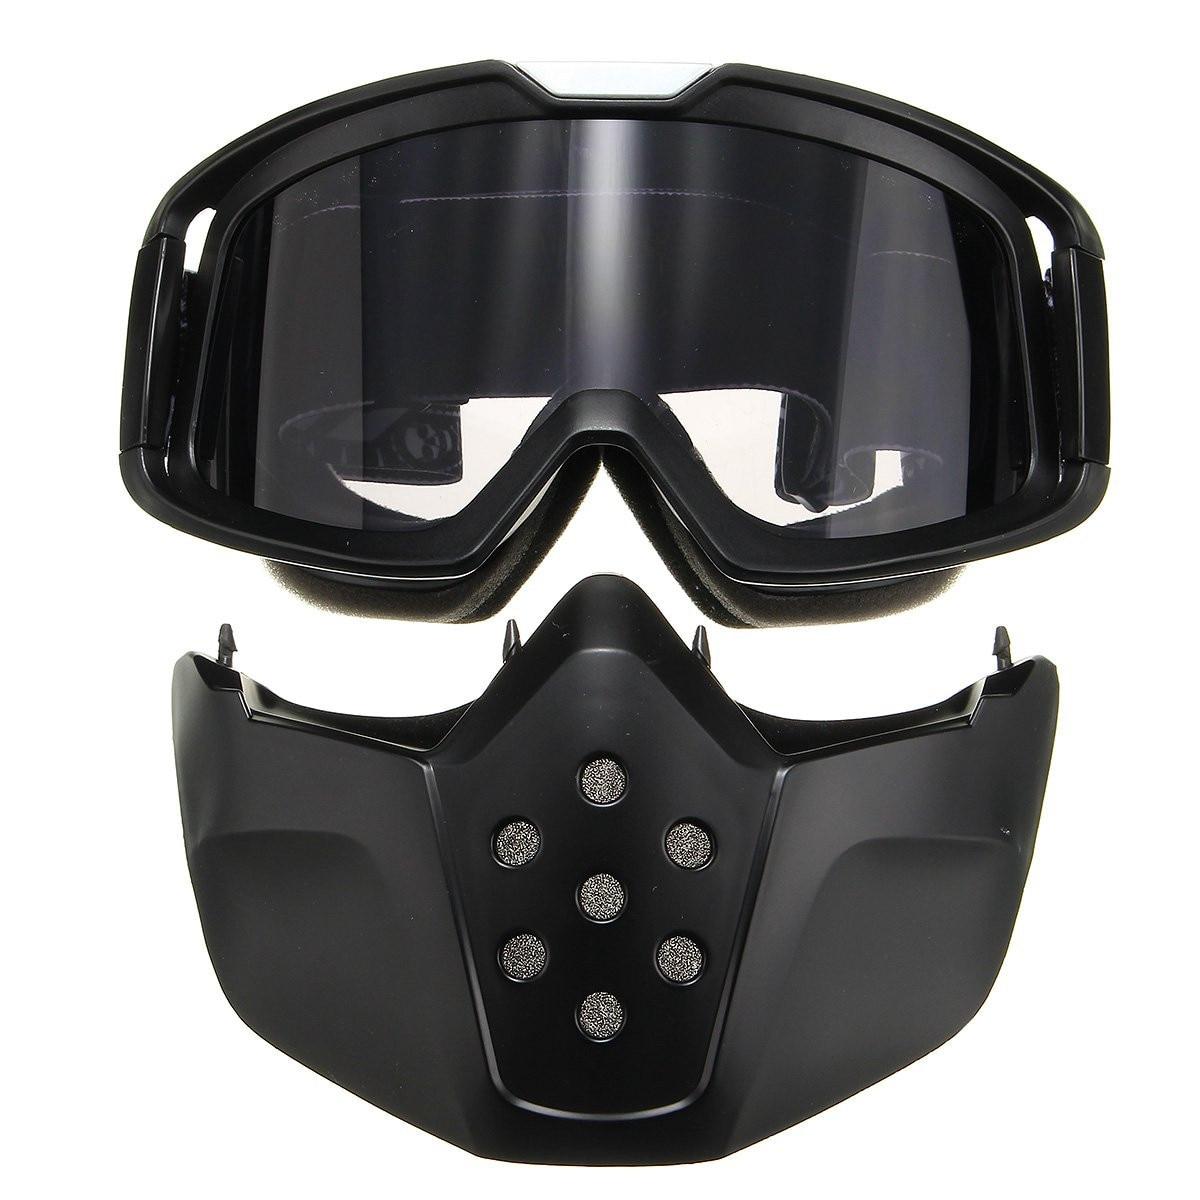 Riding Detachable Modular Face Mask font b Shield b font Goggles For Motorcycle font b Helmet